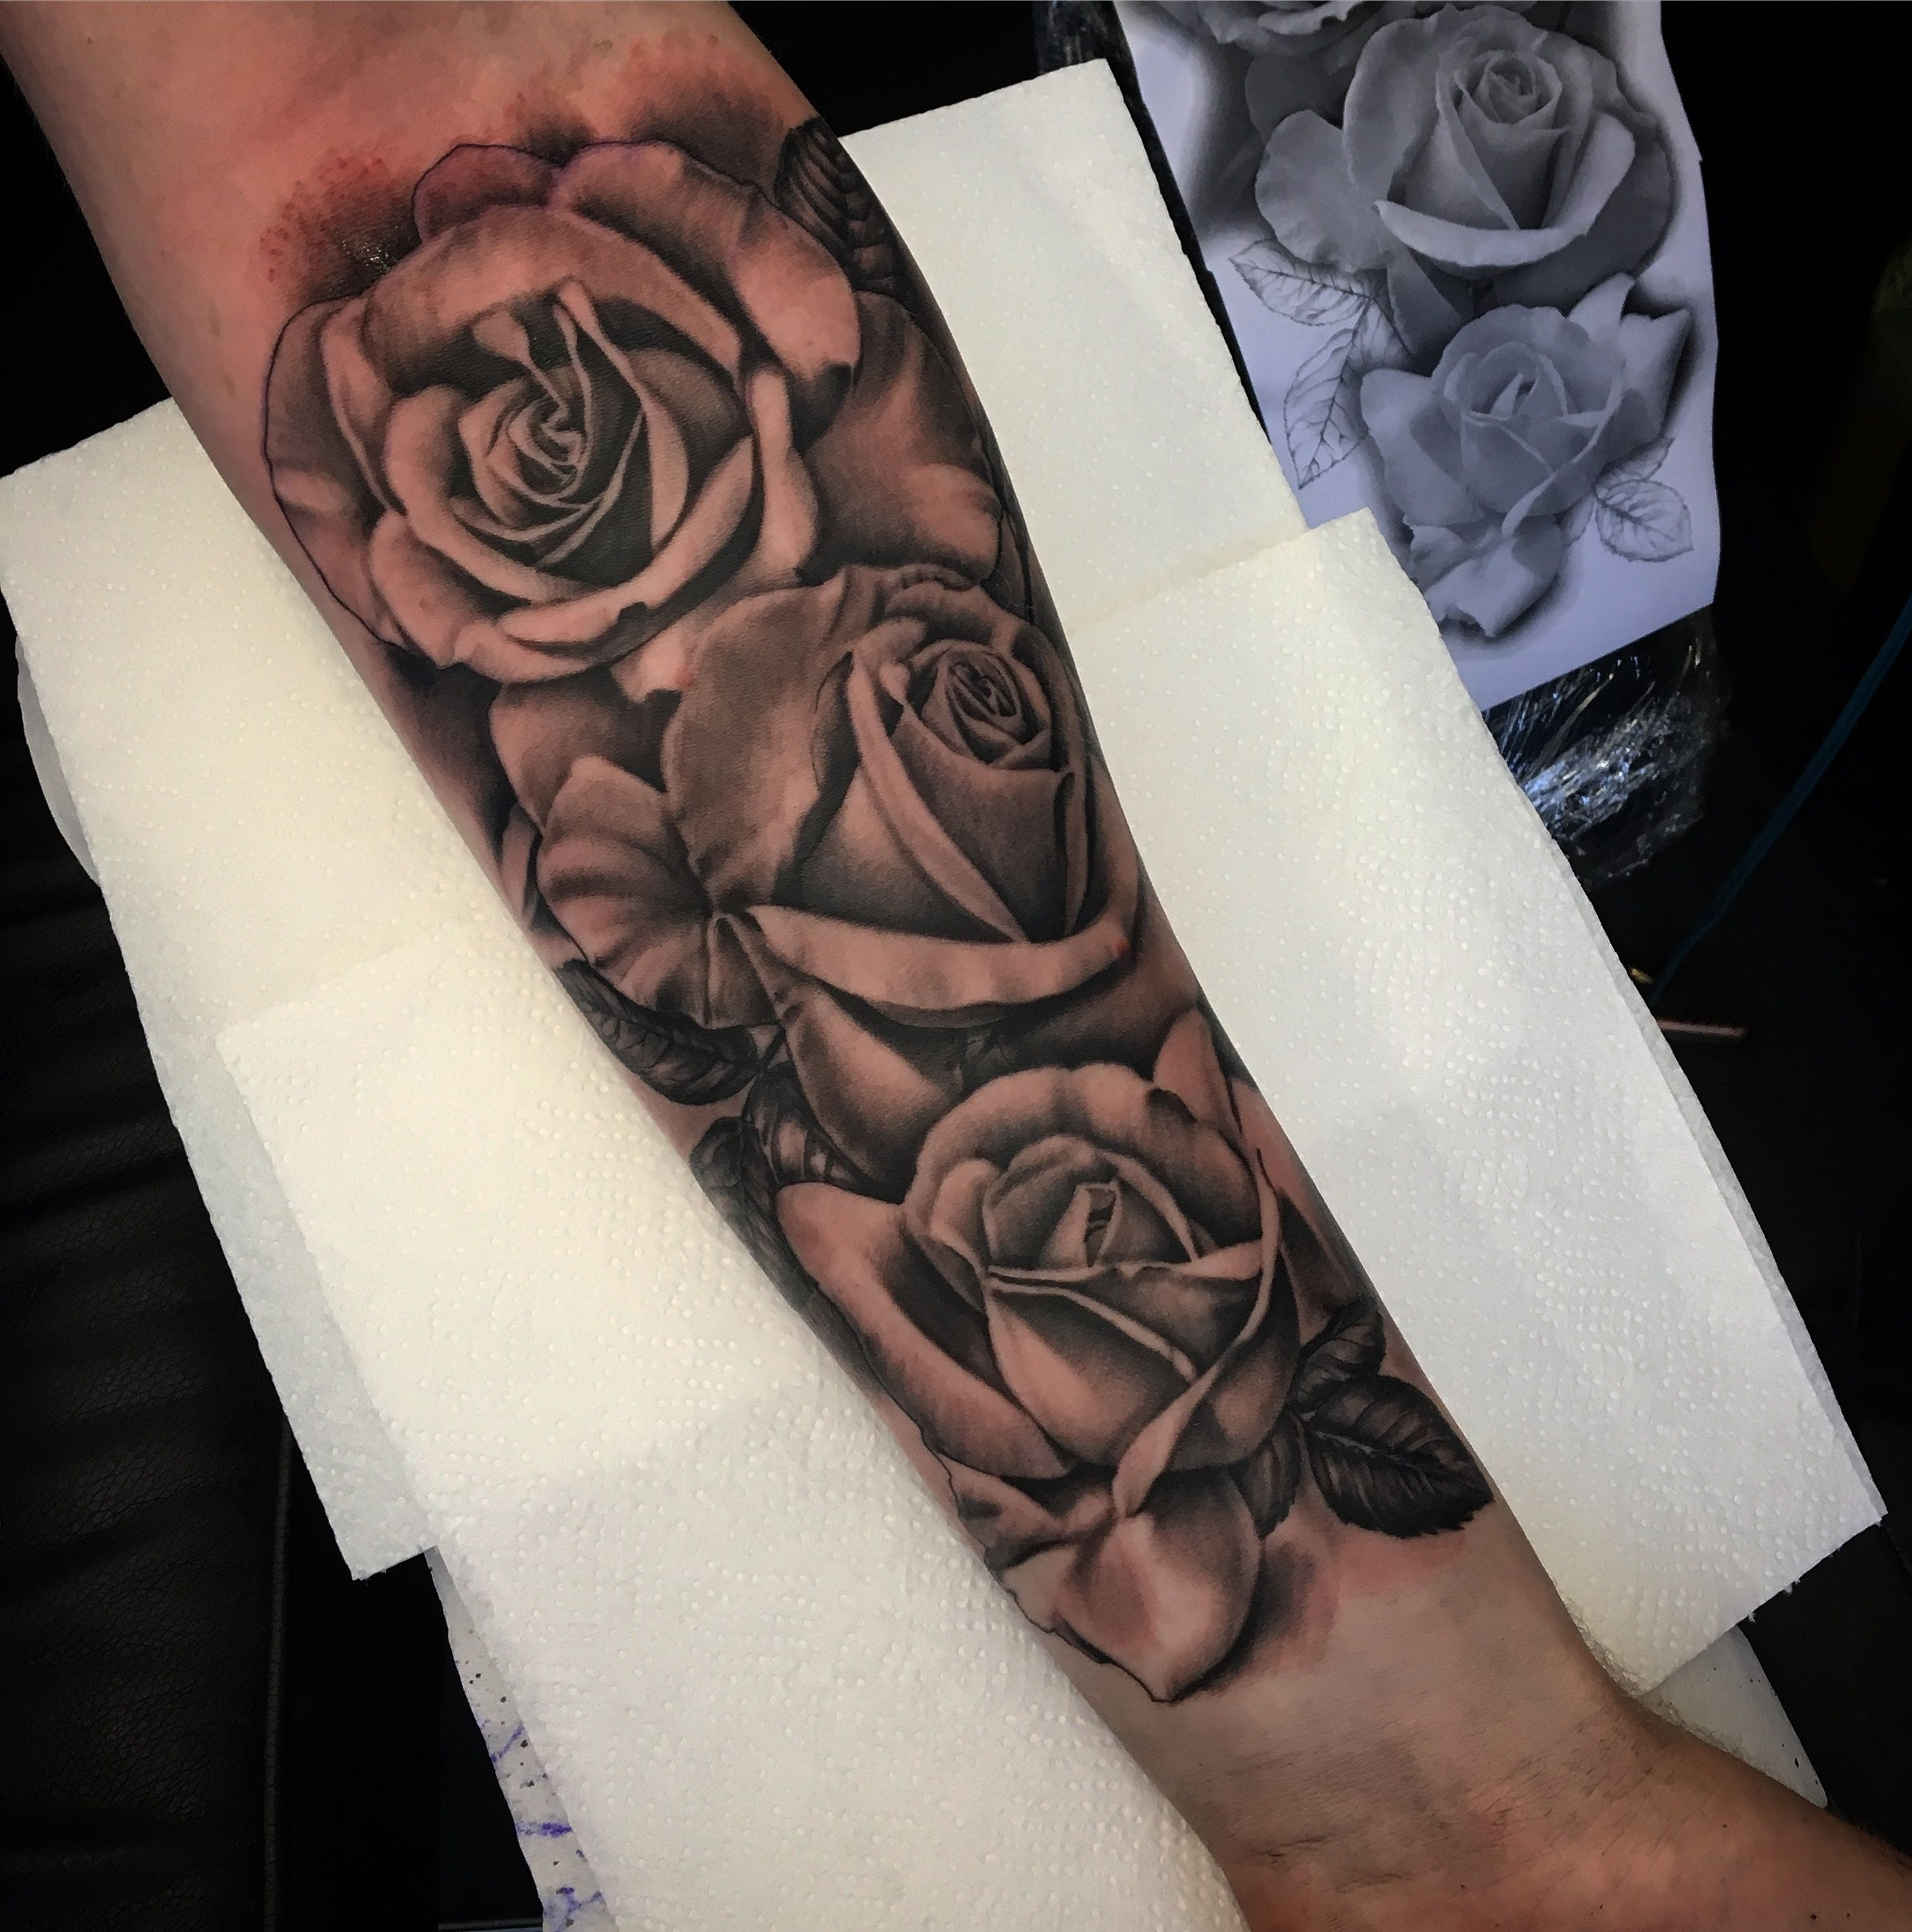 Rose Tattoo Rose Tattoos For Men Tattoos For Guys Tattoos